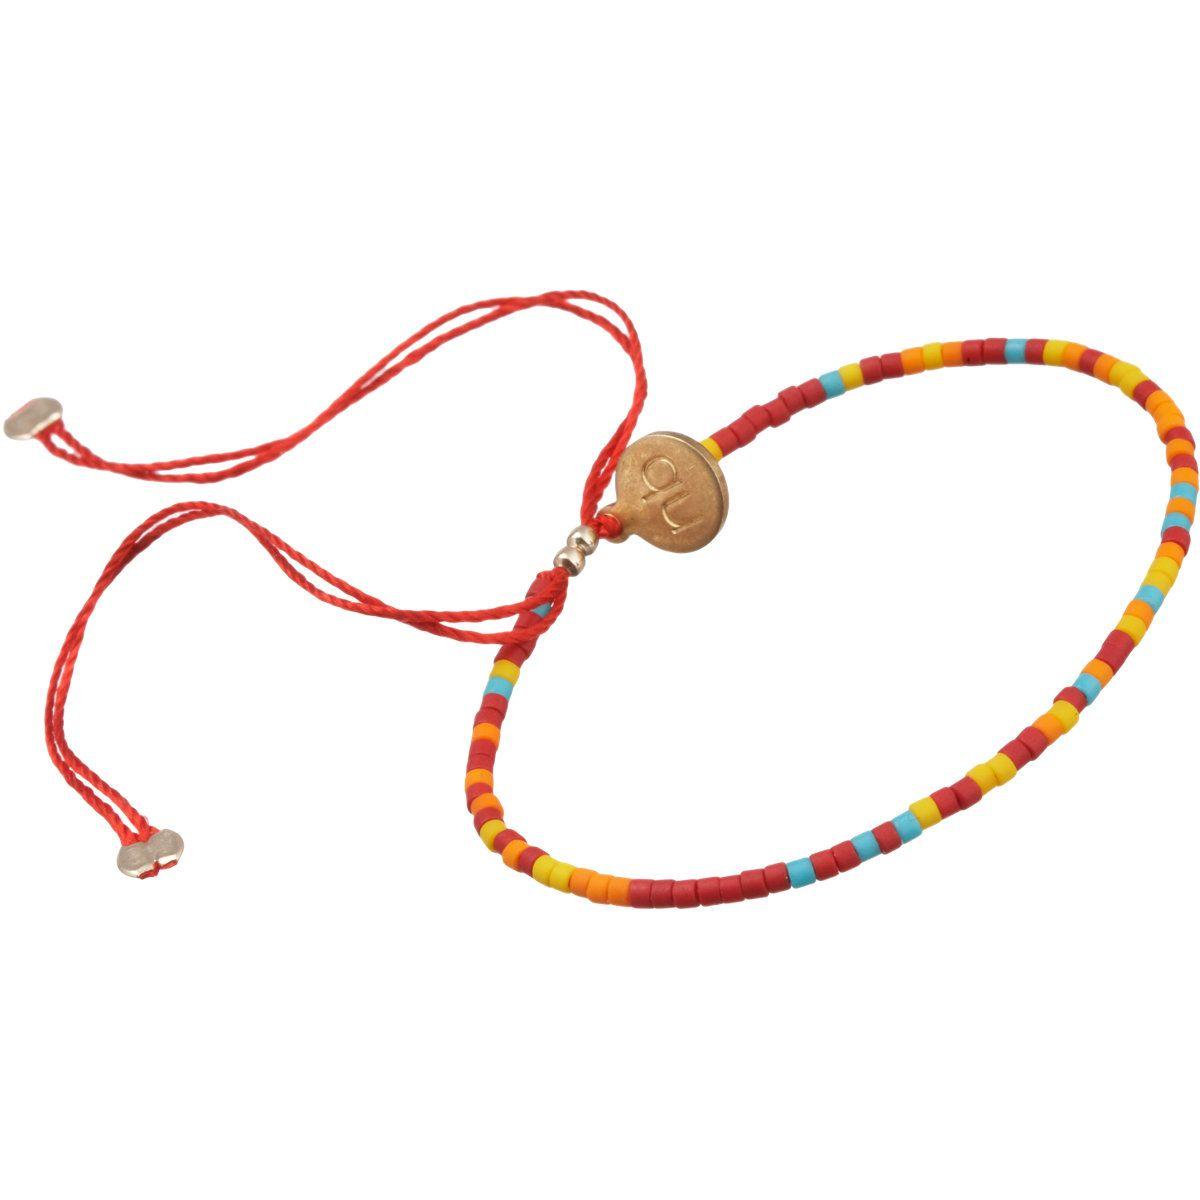 Nikki B Rainbow Bead Bracelet at Barneys.com